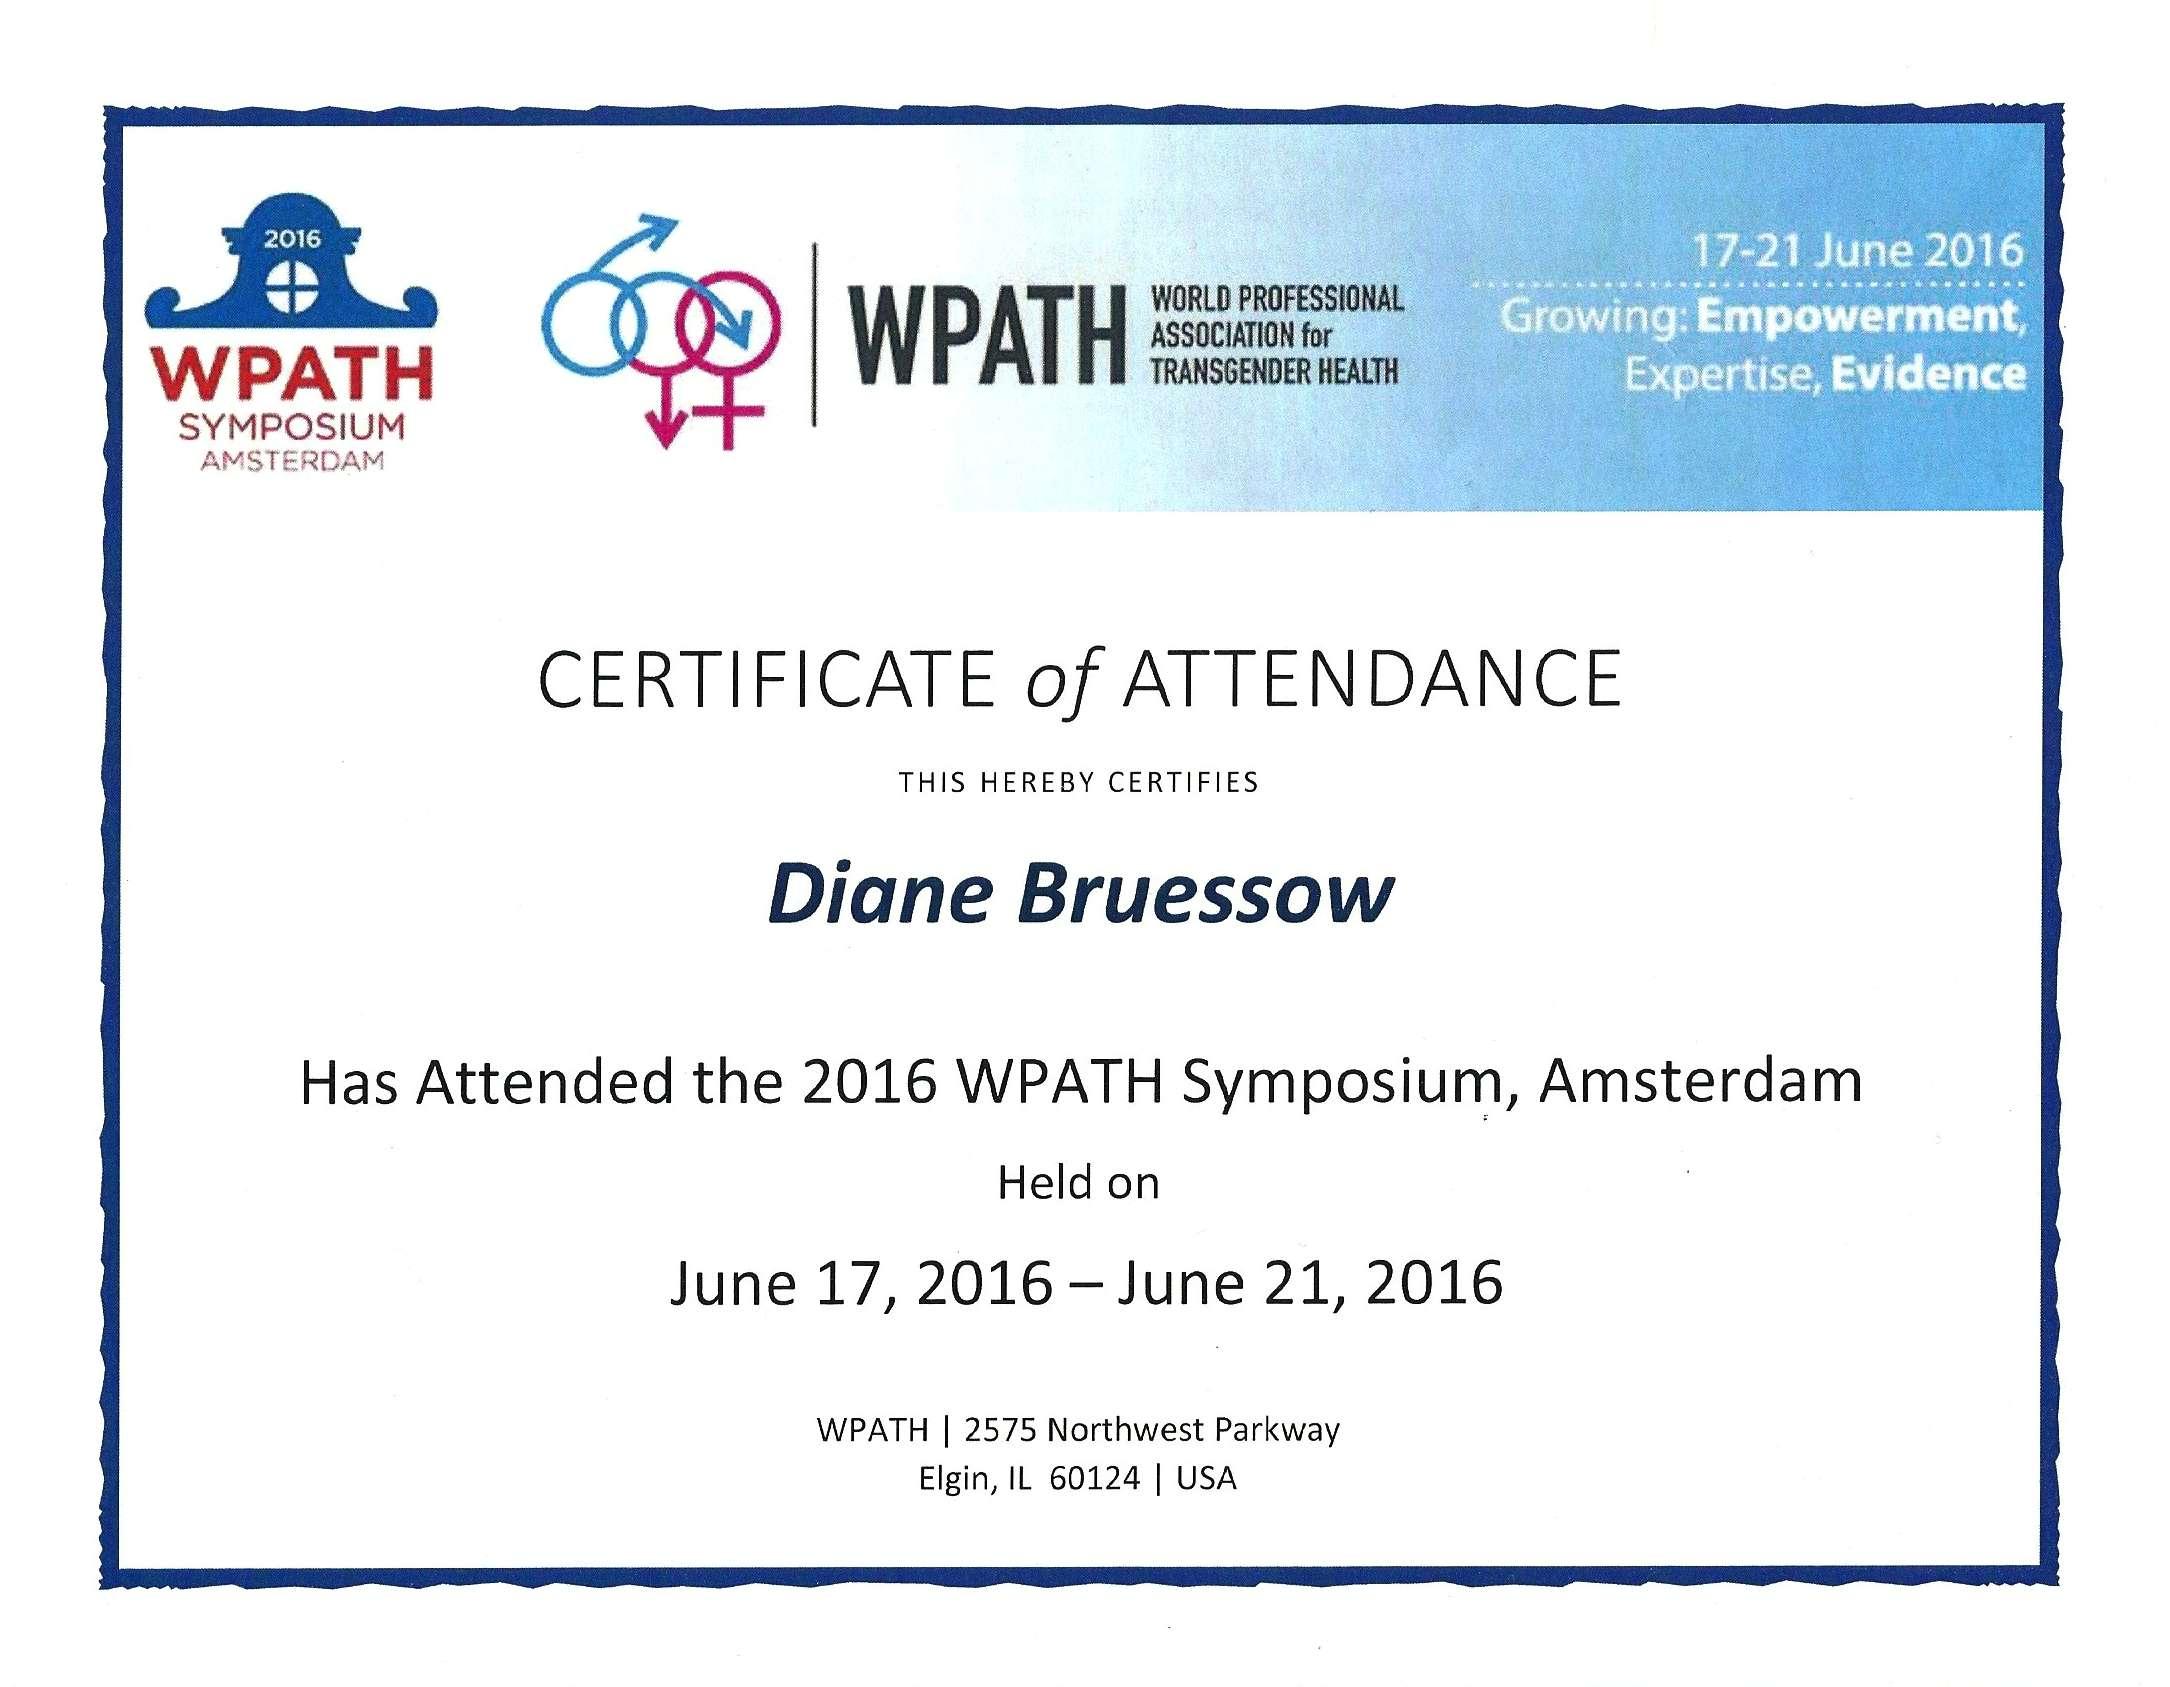 World Professional Association for Transgender Health 2016, Amsterdam